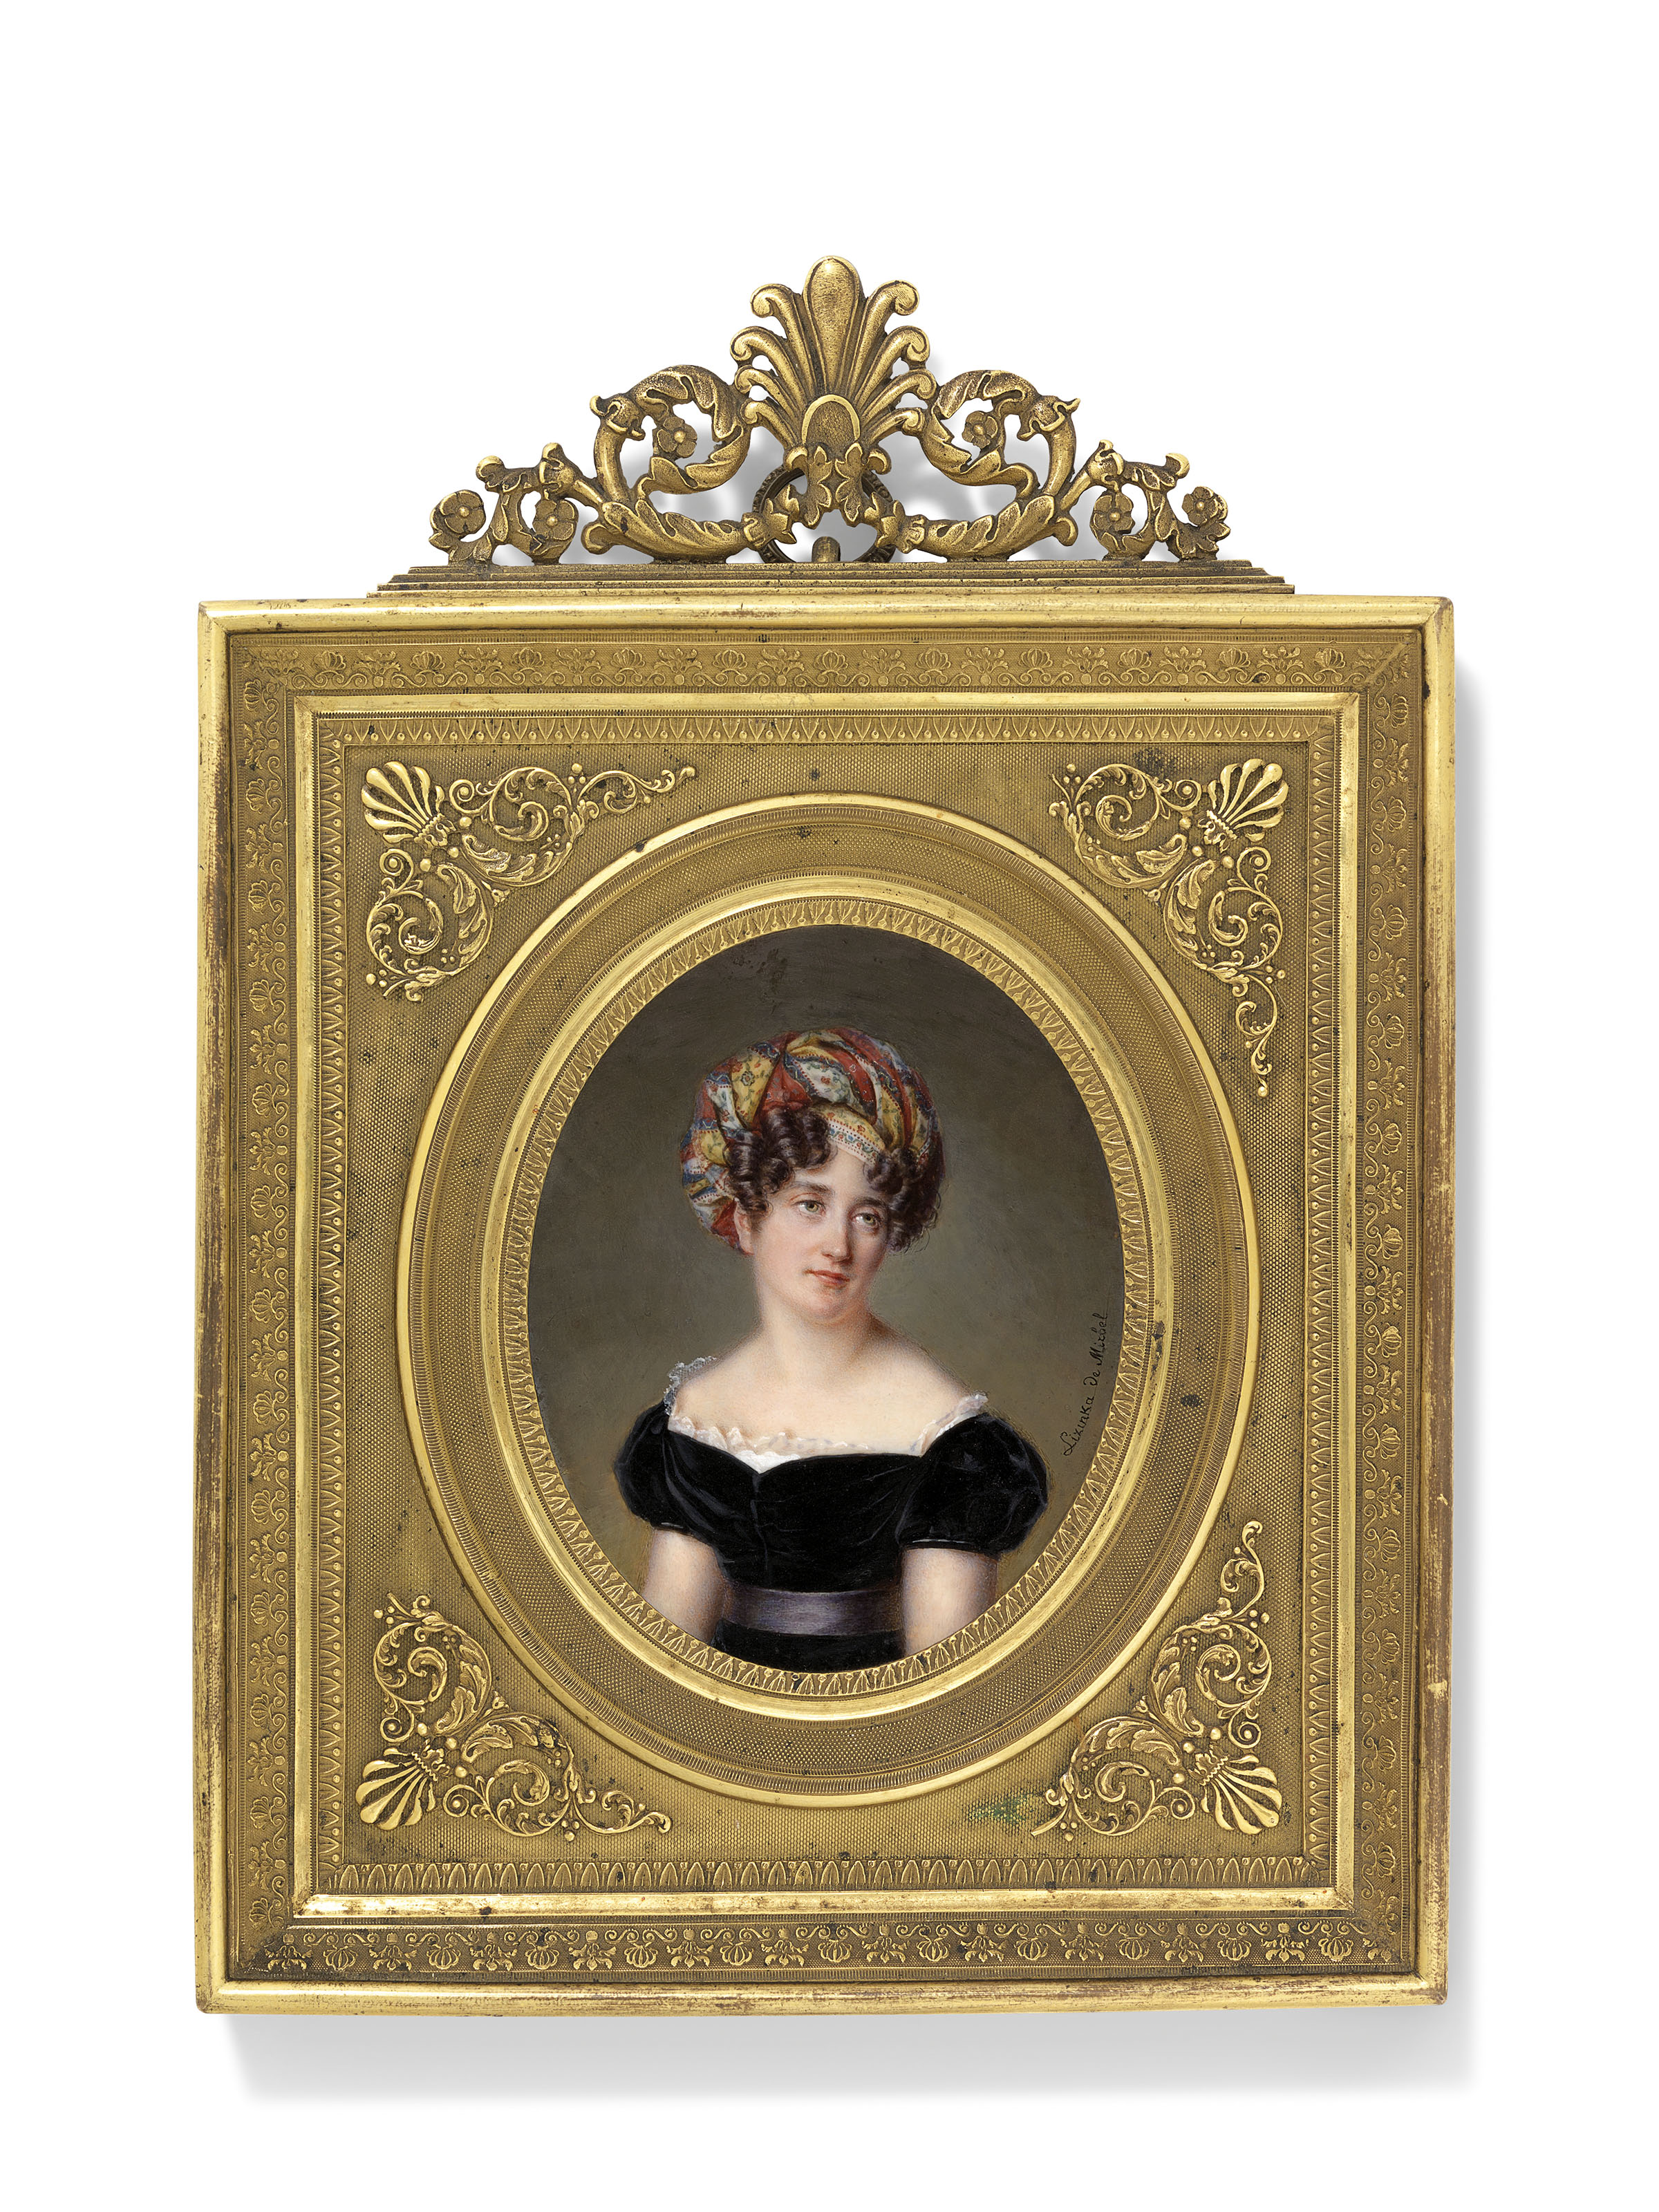 Aimée-Zoë Lizinka de Mirbel, née Rue (French, 1796-1849)